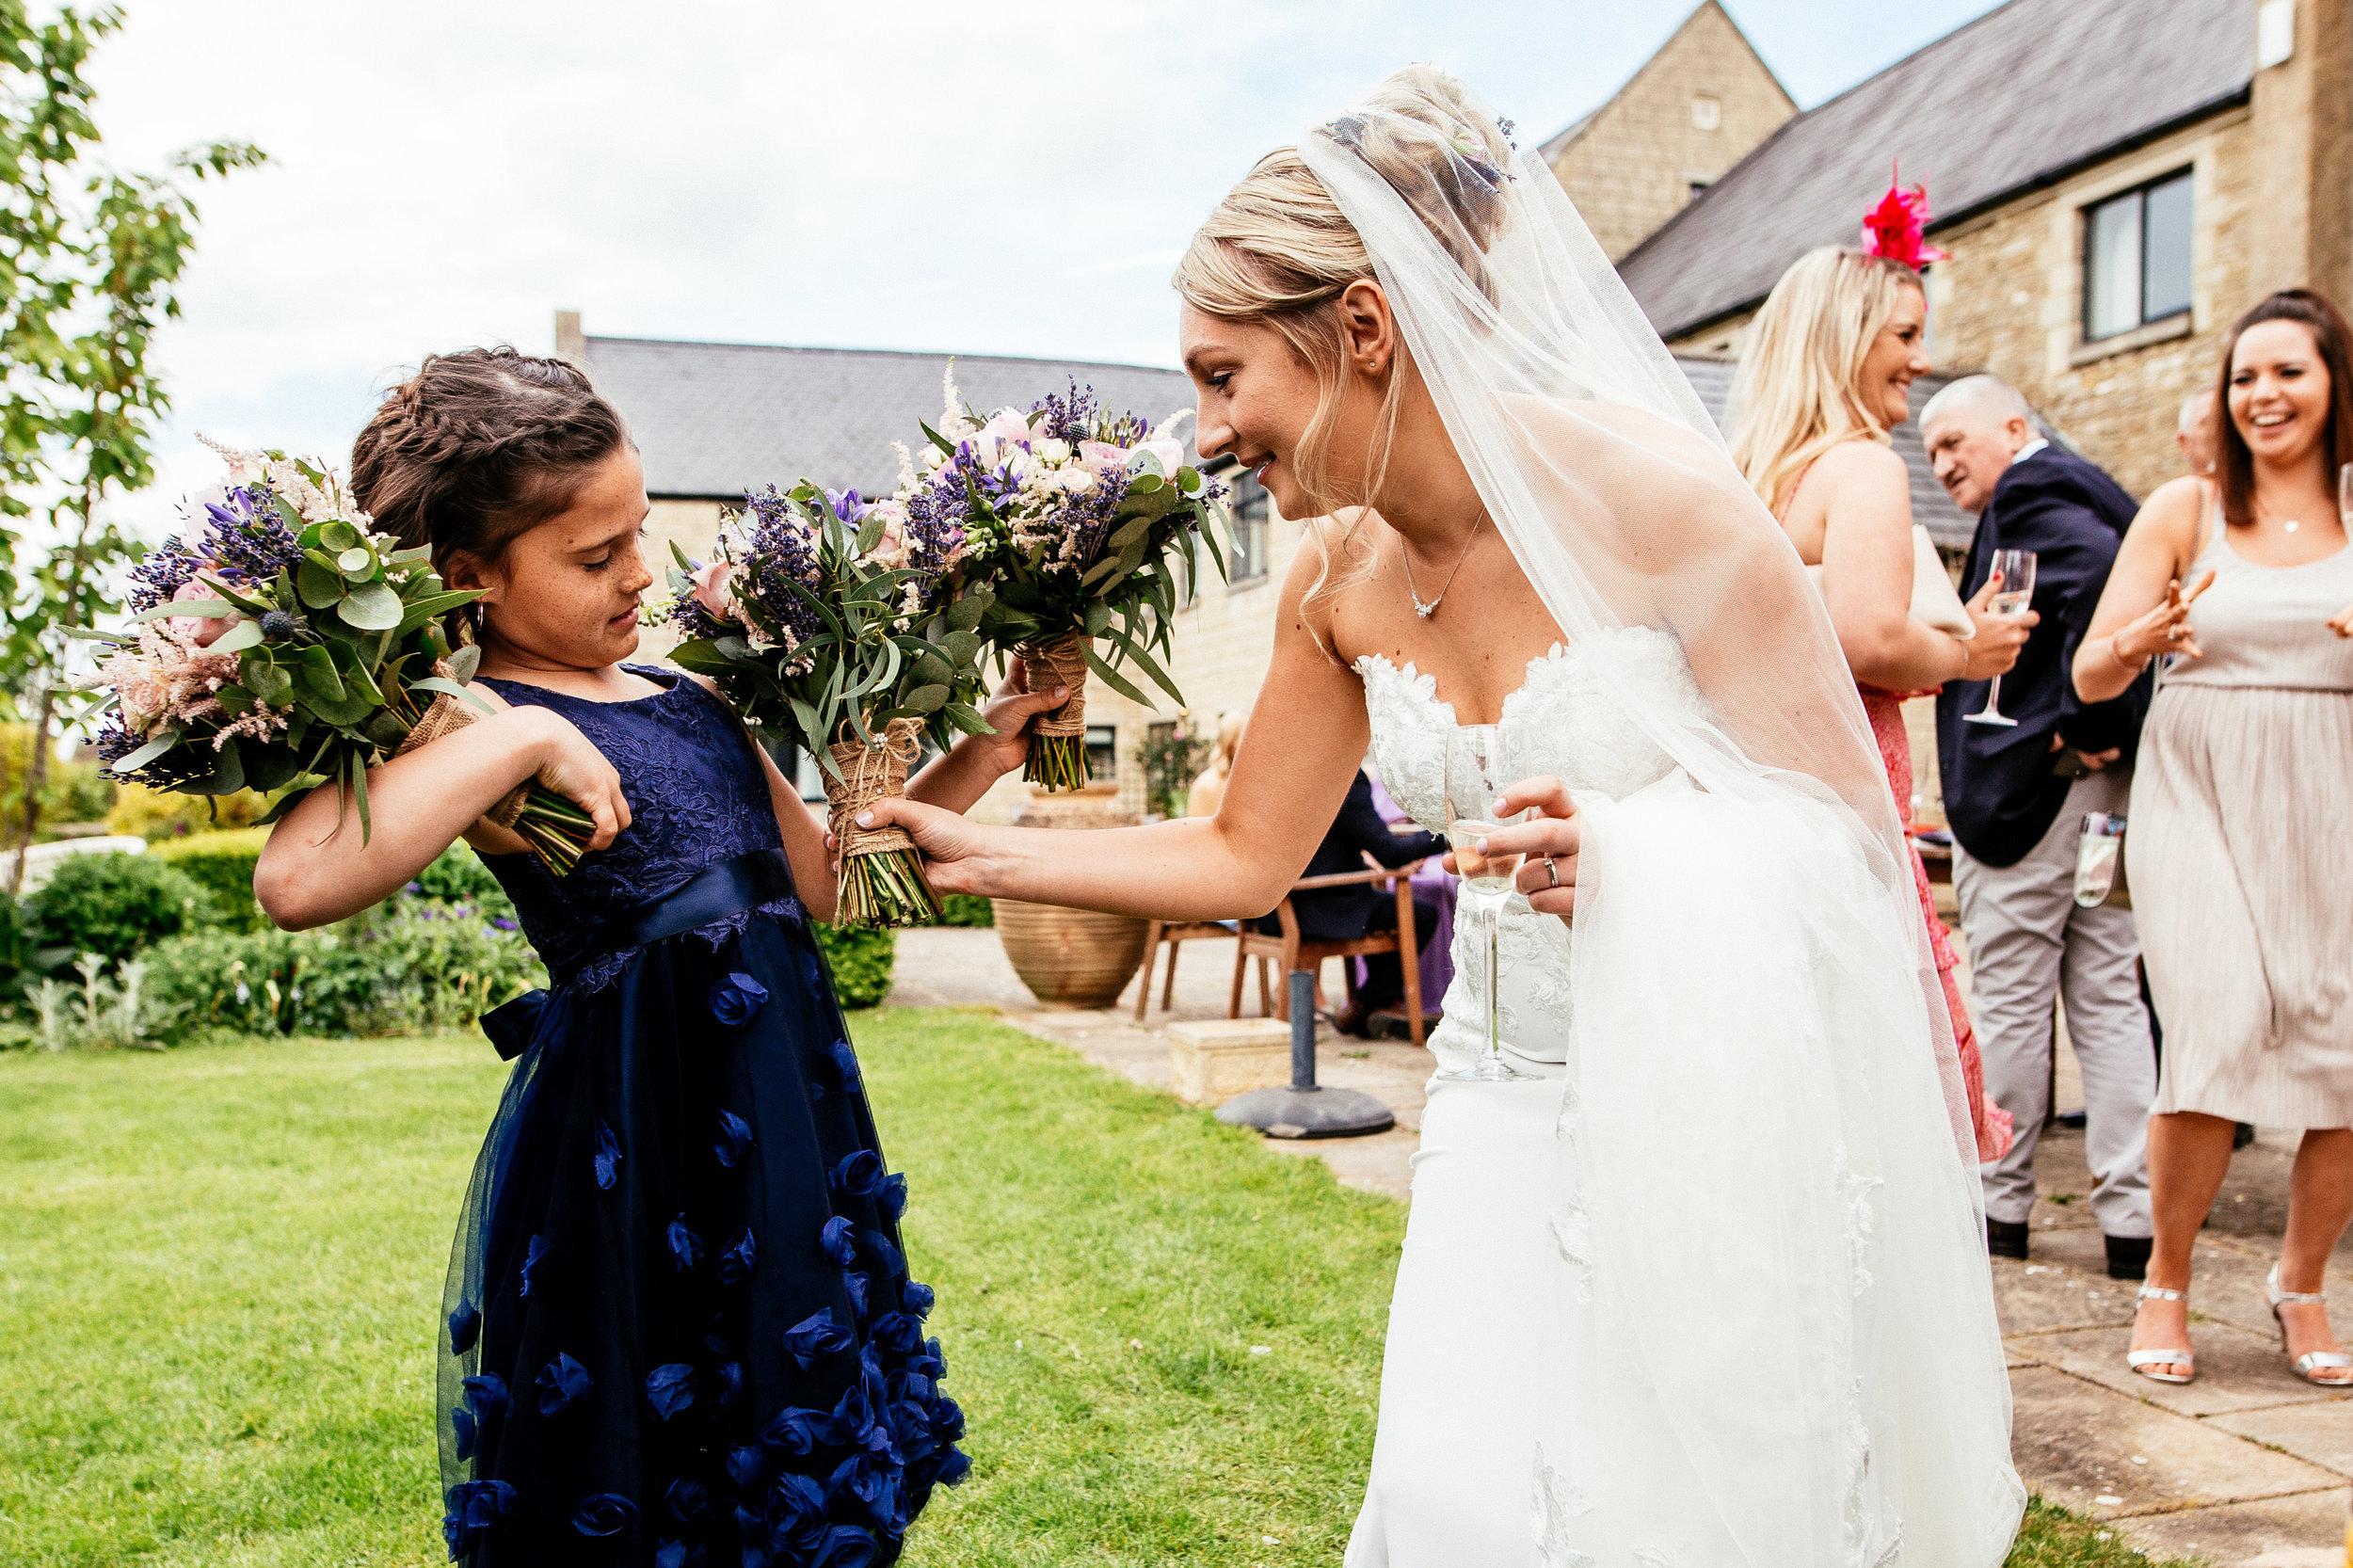 Becky-and-Sam-Wedding-Highlights-38.jpg